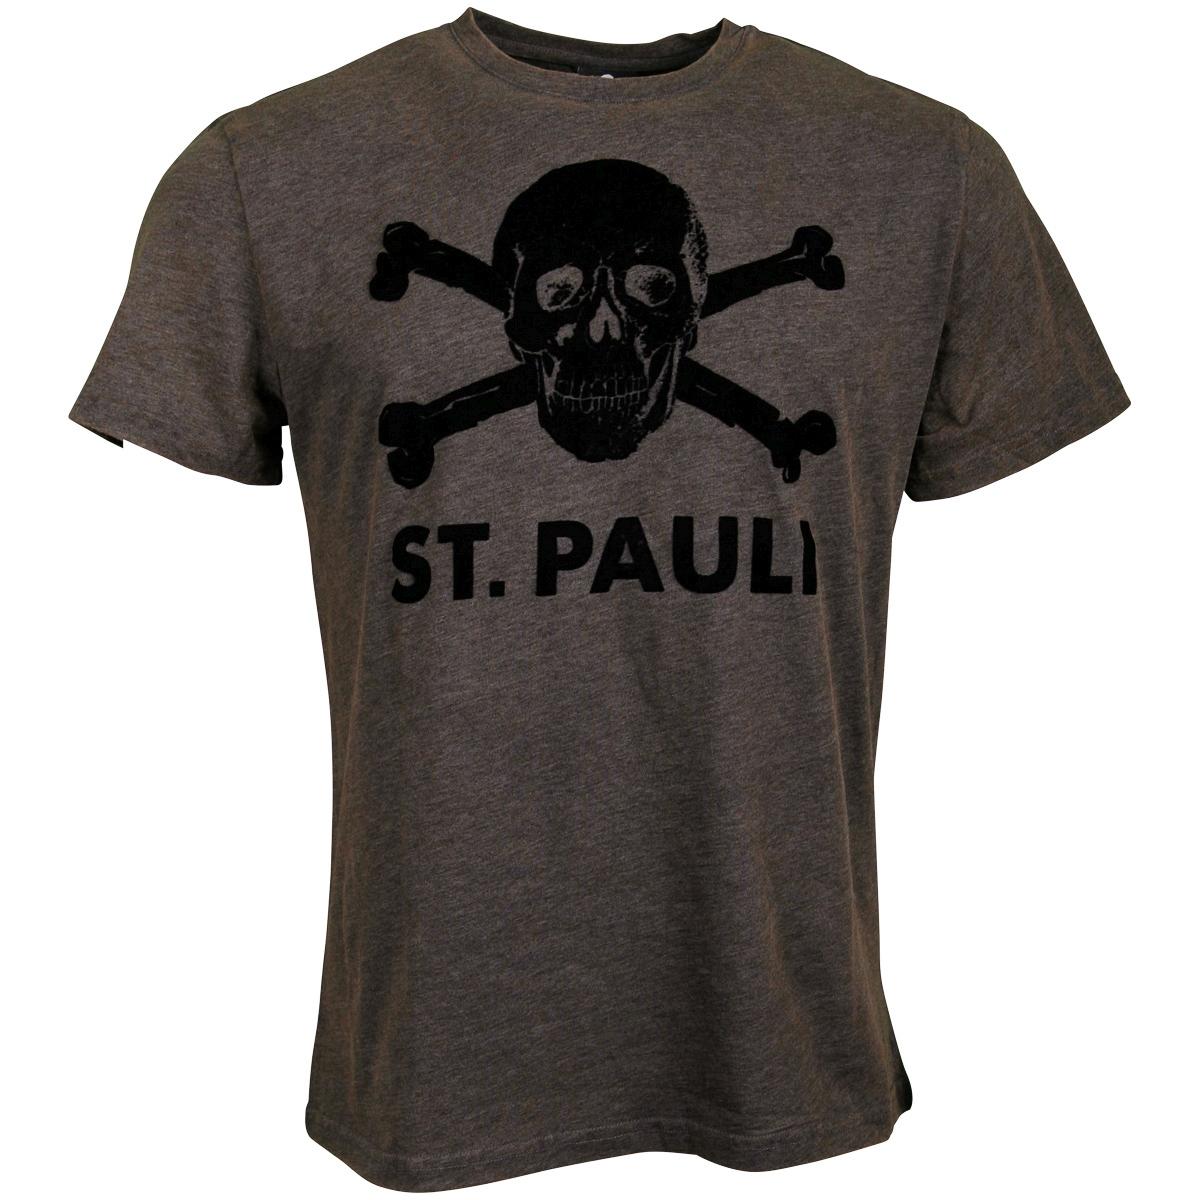 FC St. Pauli - T-Shirt Brown Melange Totenkopf - braun